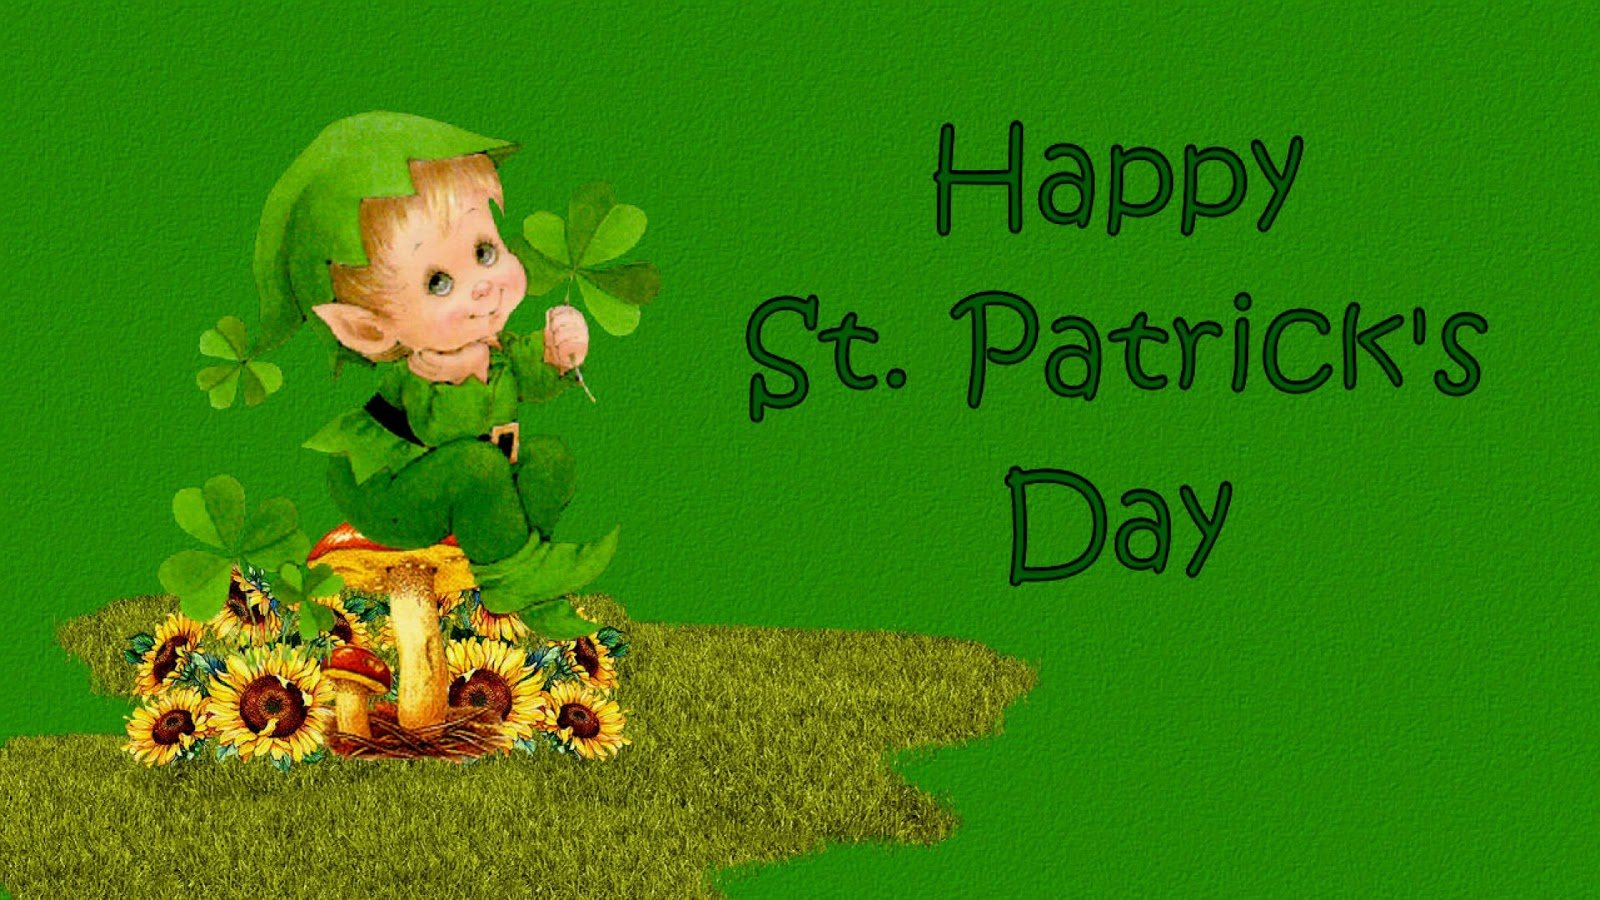 St Patrick S Day Wallpapers 1600x900 Desktop Backgrounds